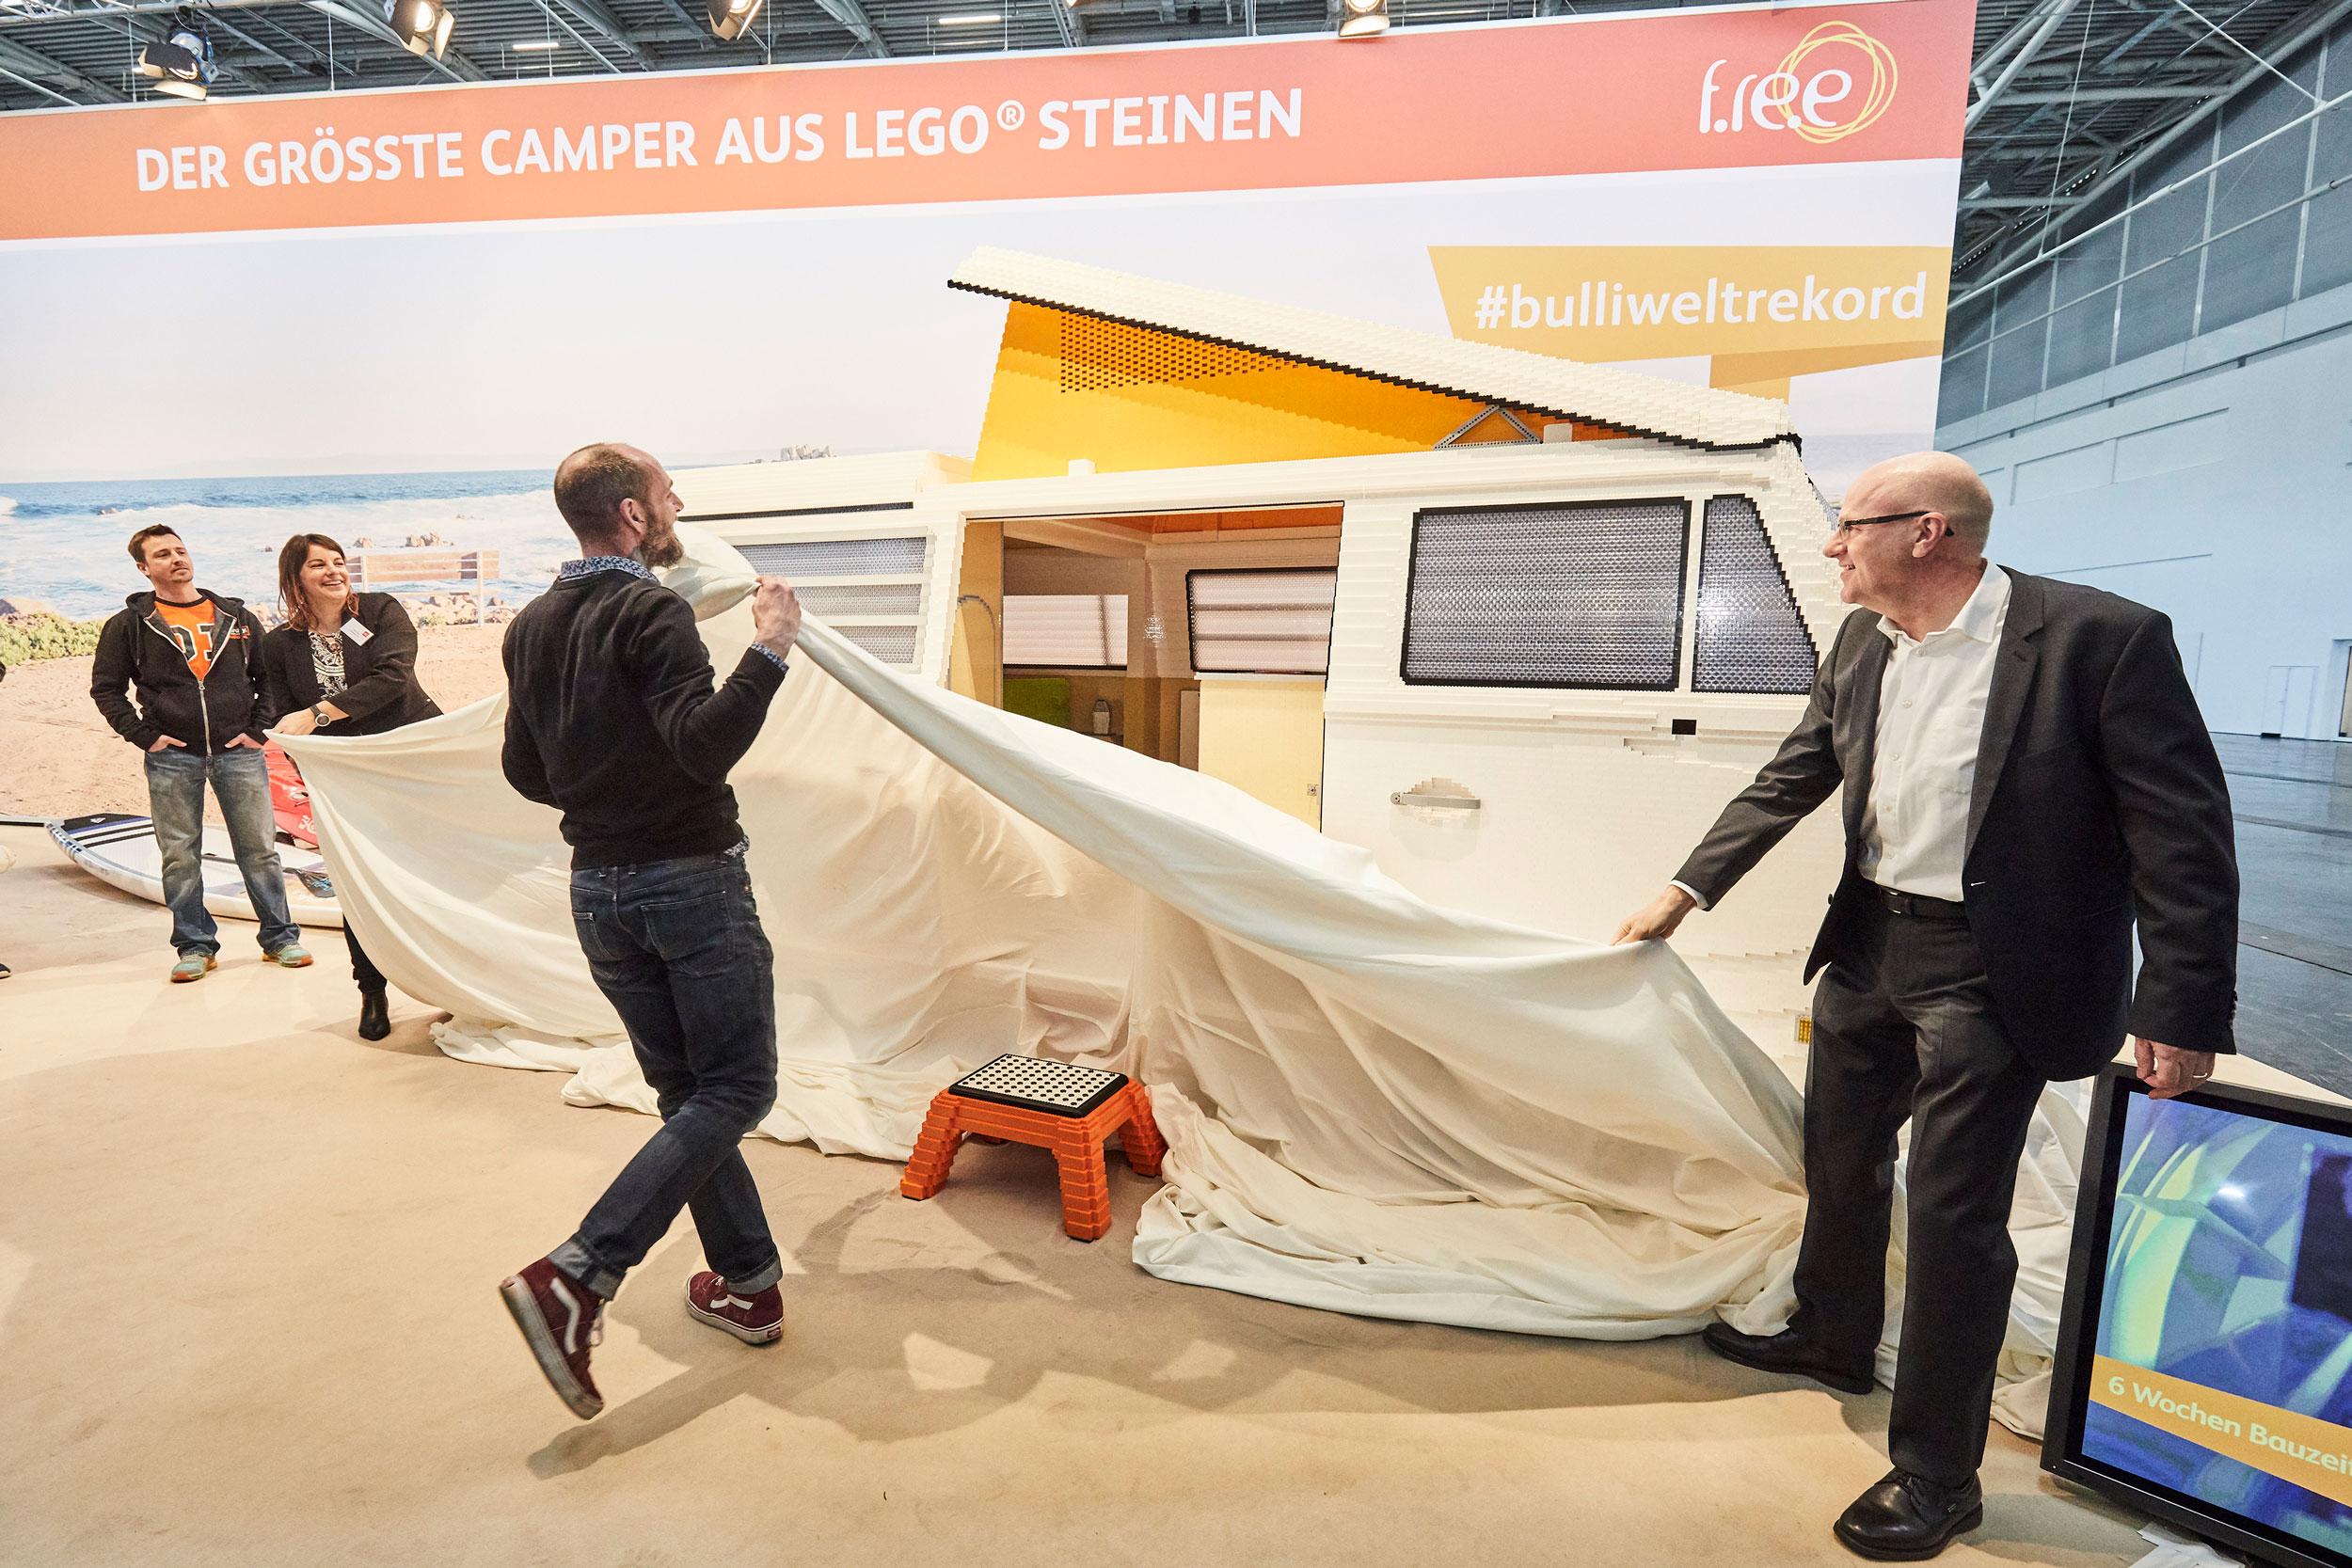 Volkswagen Type 2 created from 400,000 LEGO bricks reveal